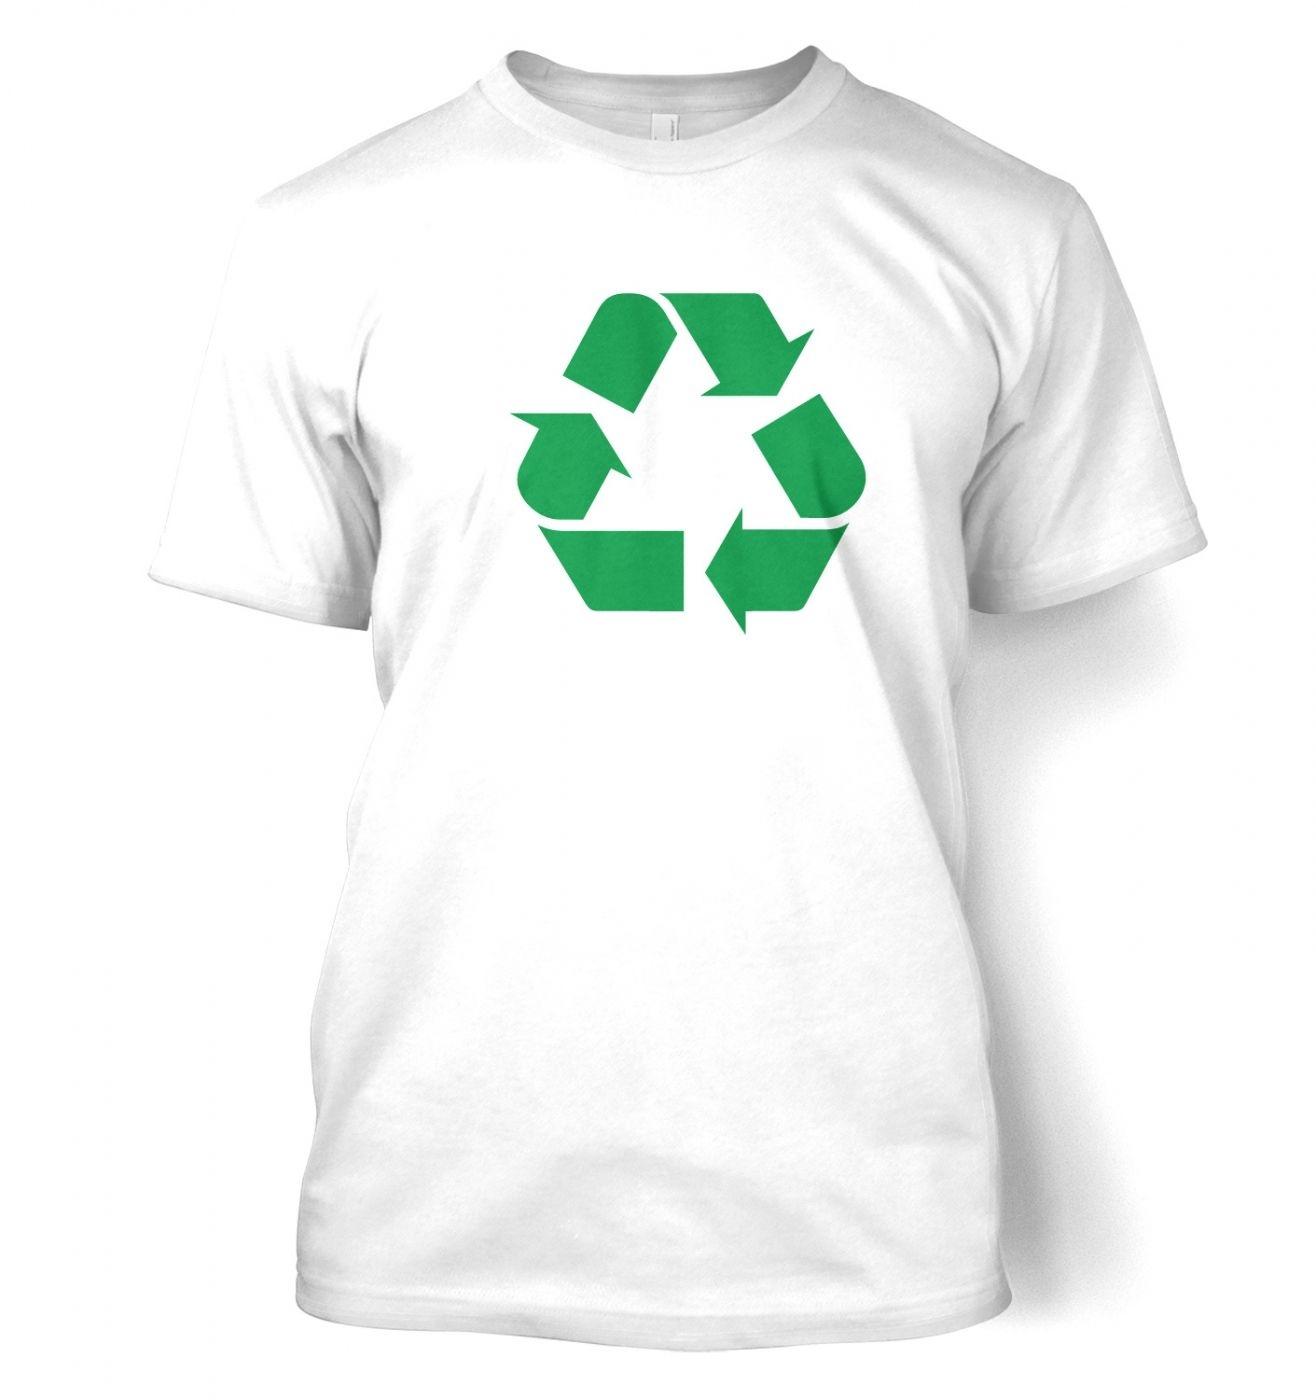 Green Recycling Symbol men's t-shirt